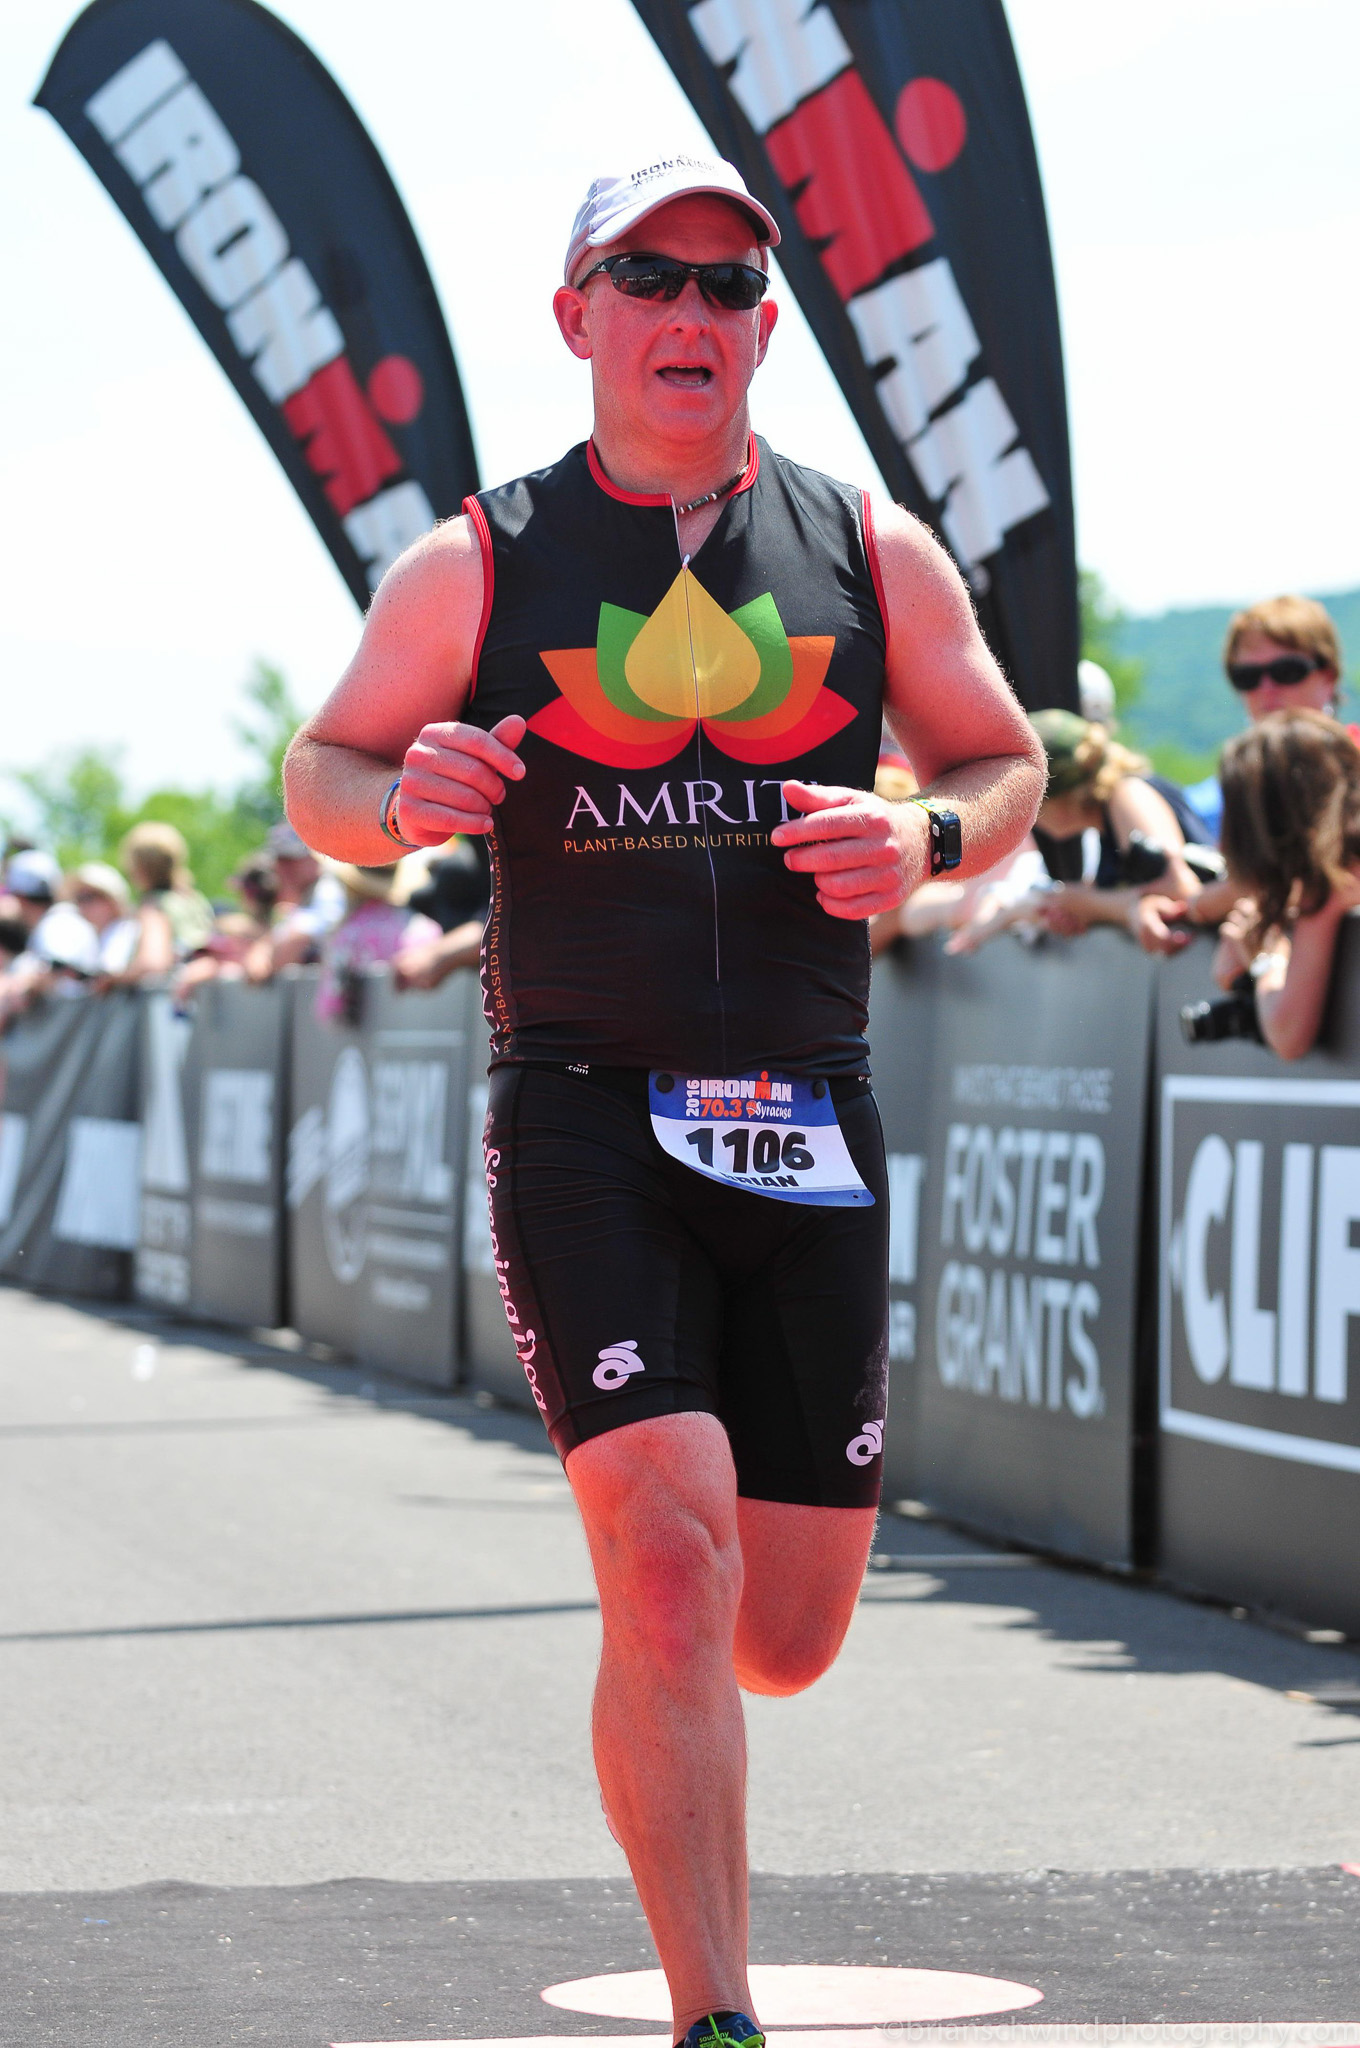 Ironman 70.3 Syracuse 2016-20160622009.jpg